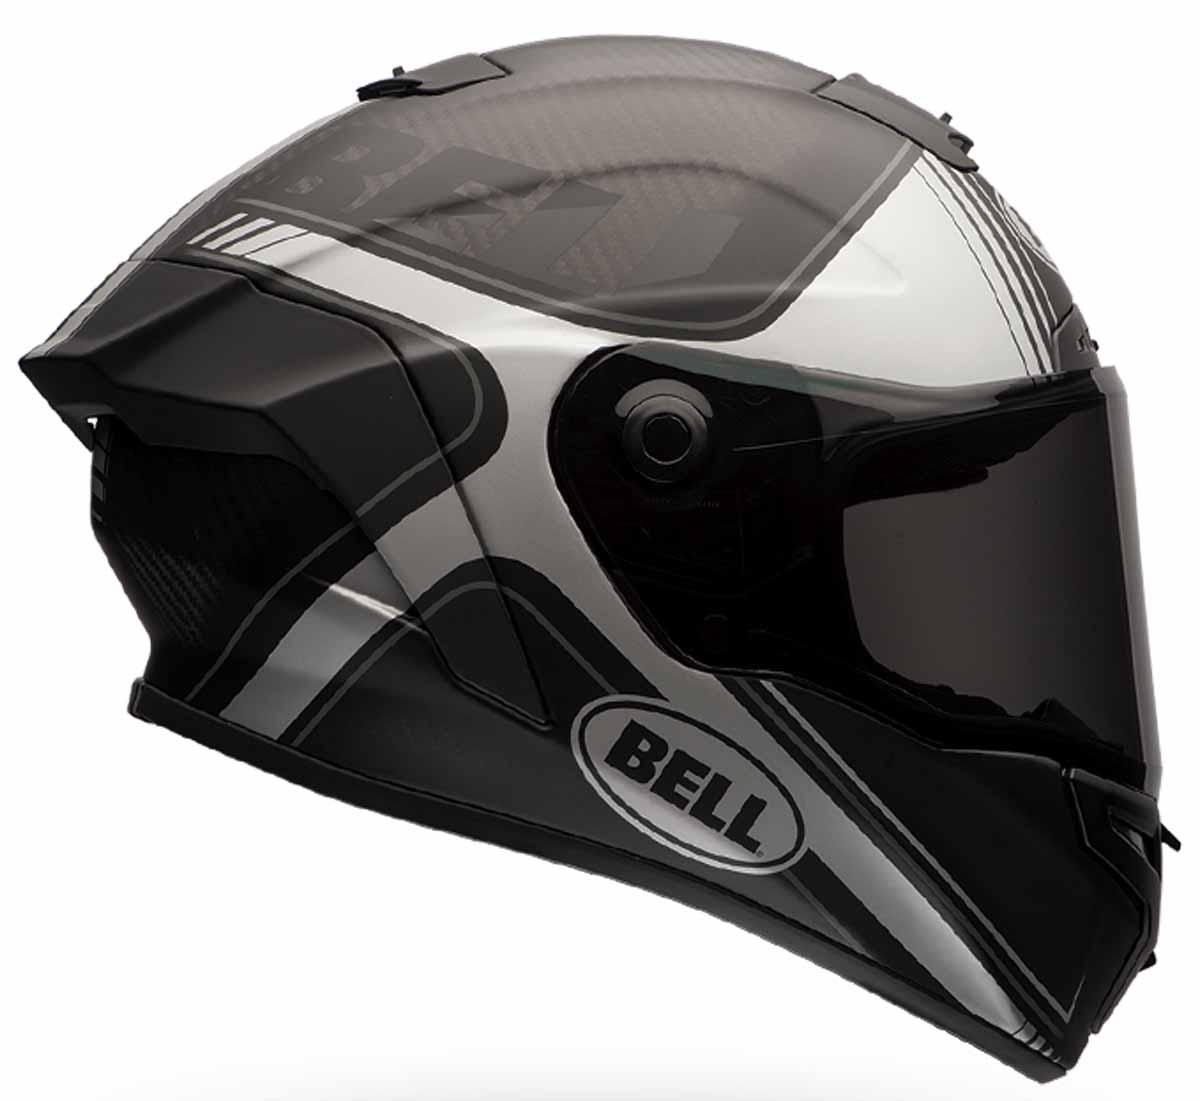 7098b8be Bell Race Star Tracer Helmet Black/Grey. Previous